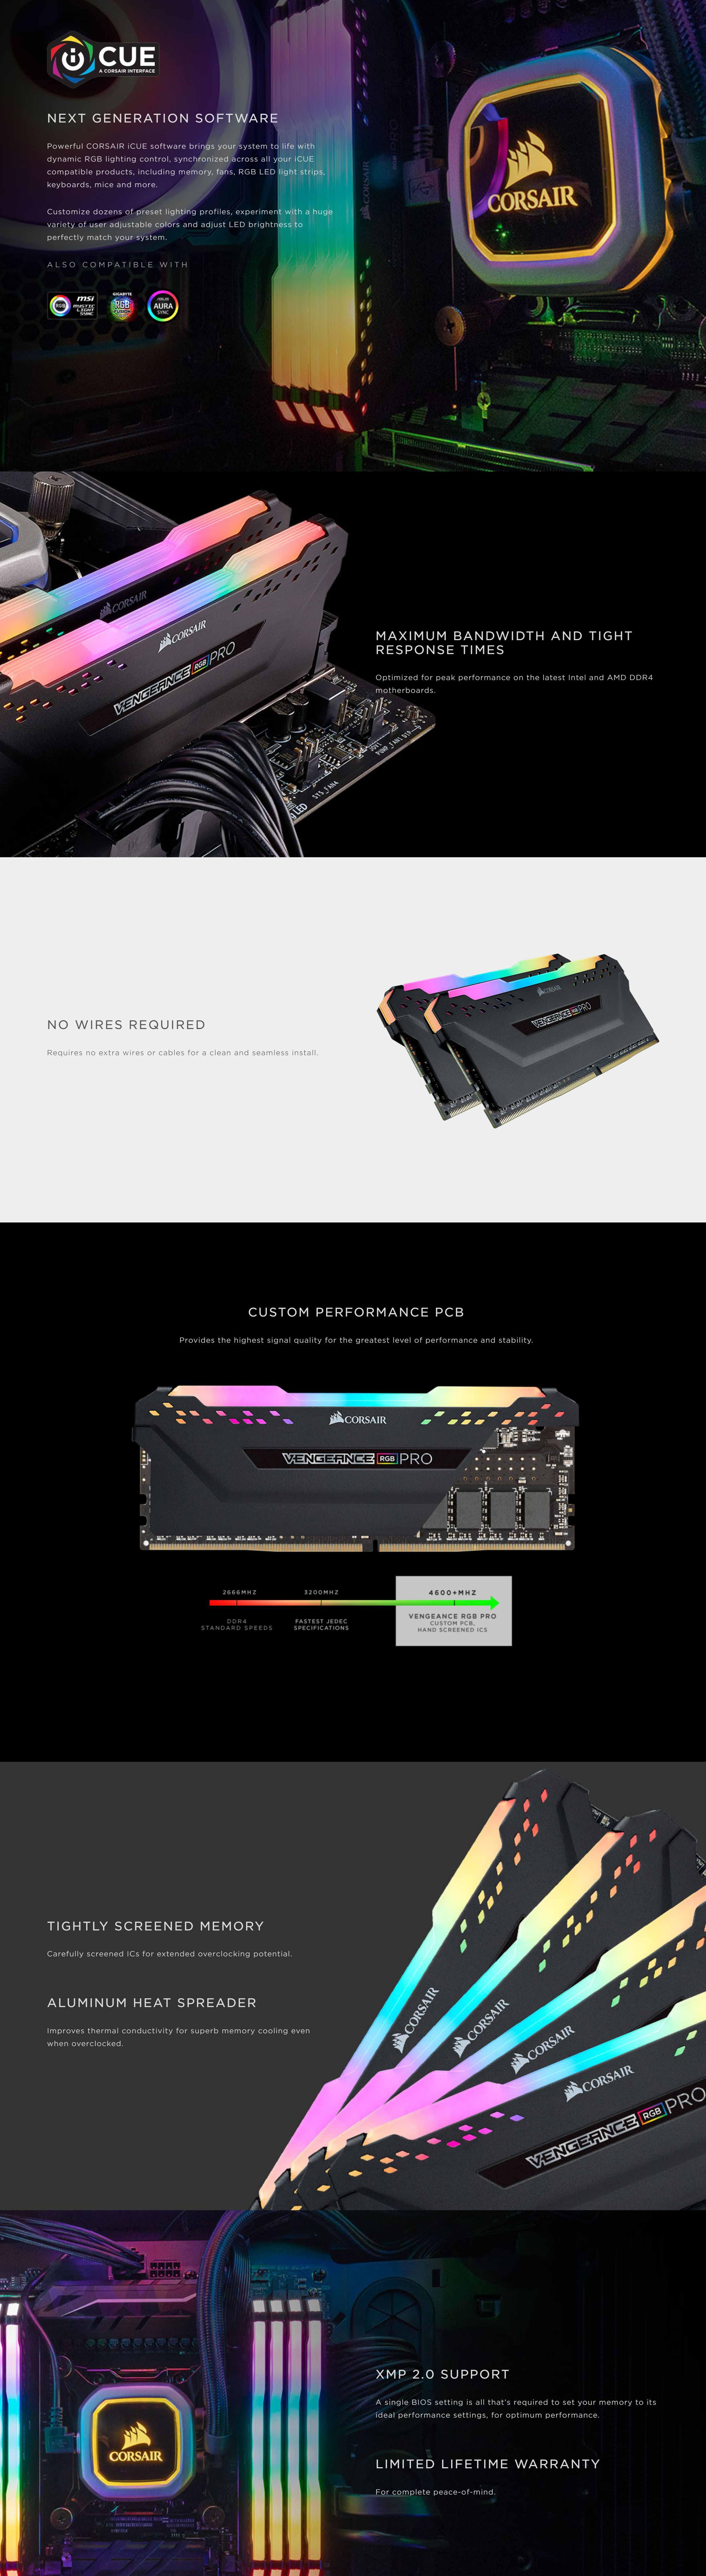 #1567---'VENGEANCE®-RGB-PRO-32GB-(2-x-16GB)-DDR4-DRAM-3333MHz-C16-Memory-Kit-—-Black'---www_corsair_com.jpg